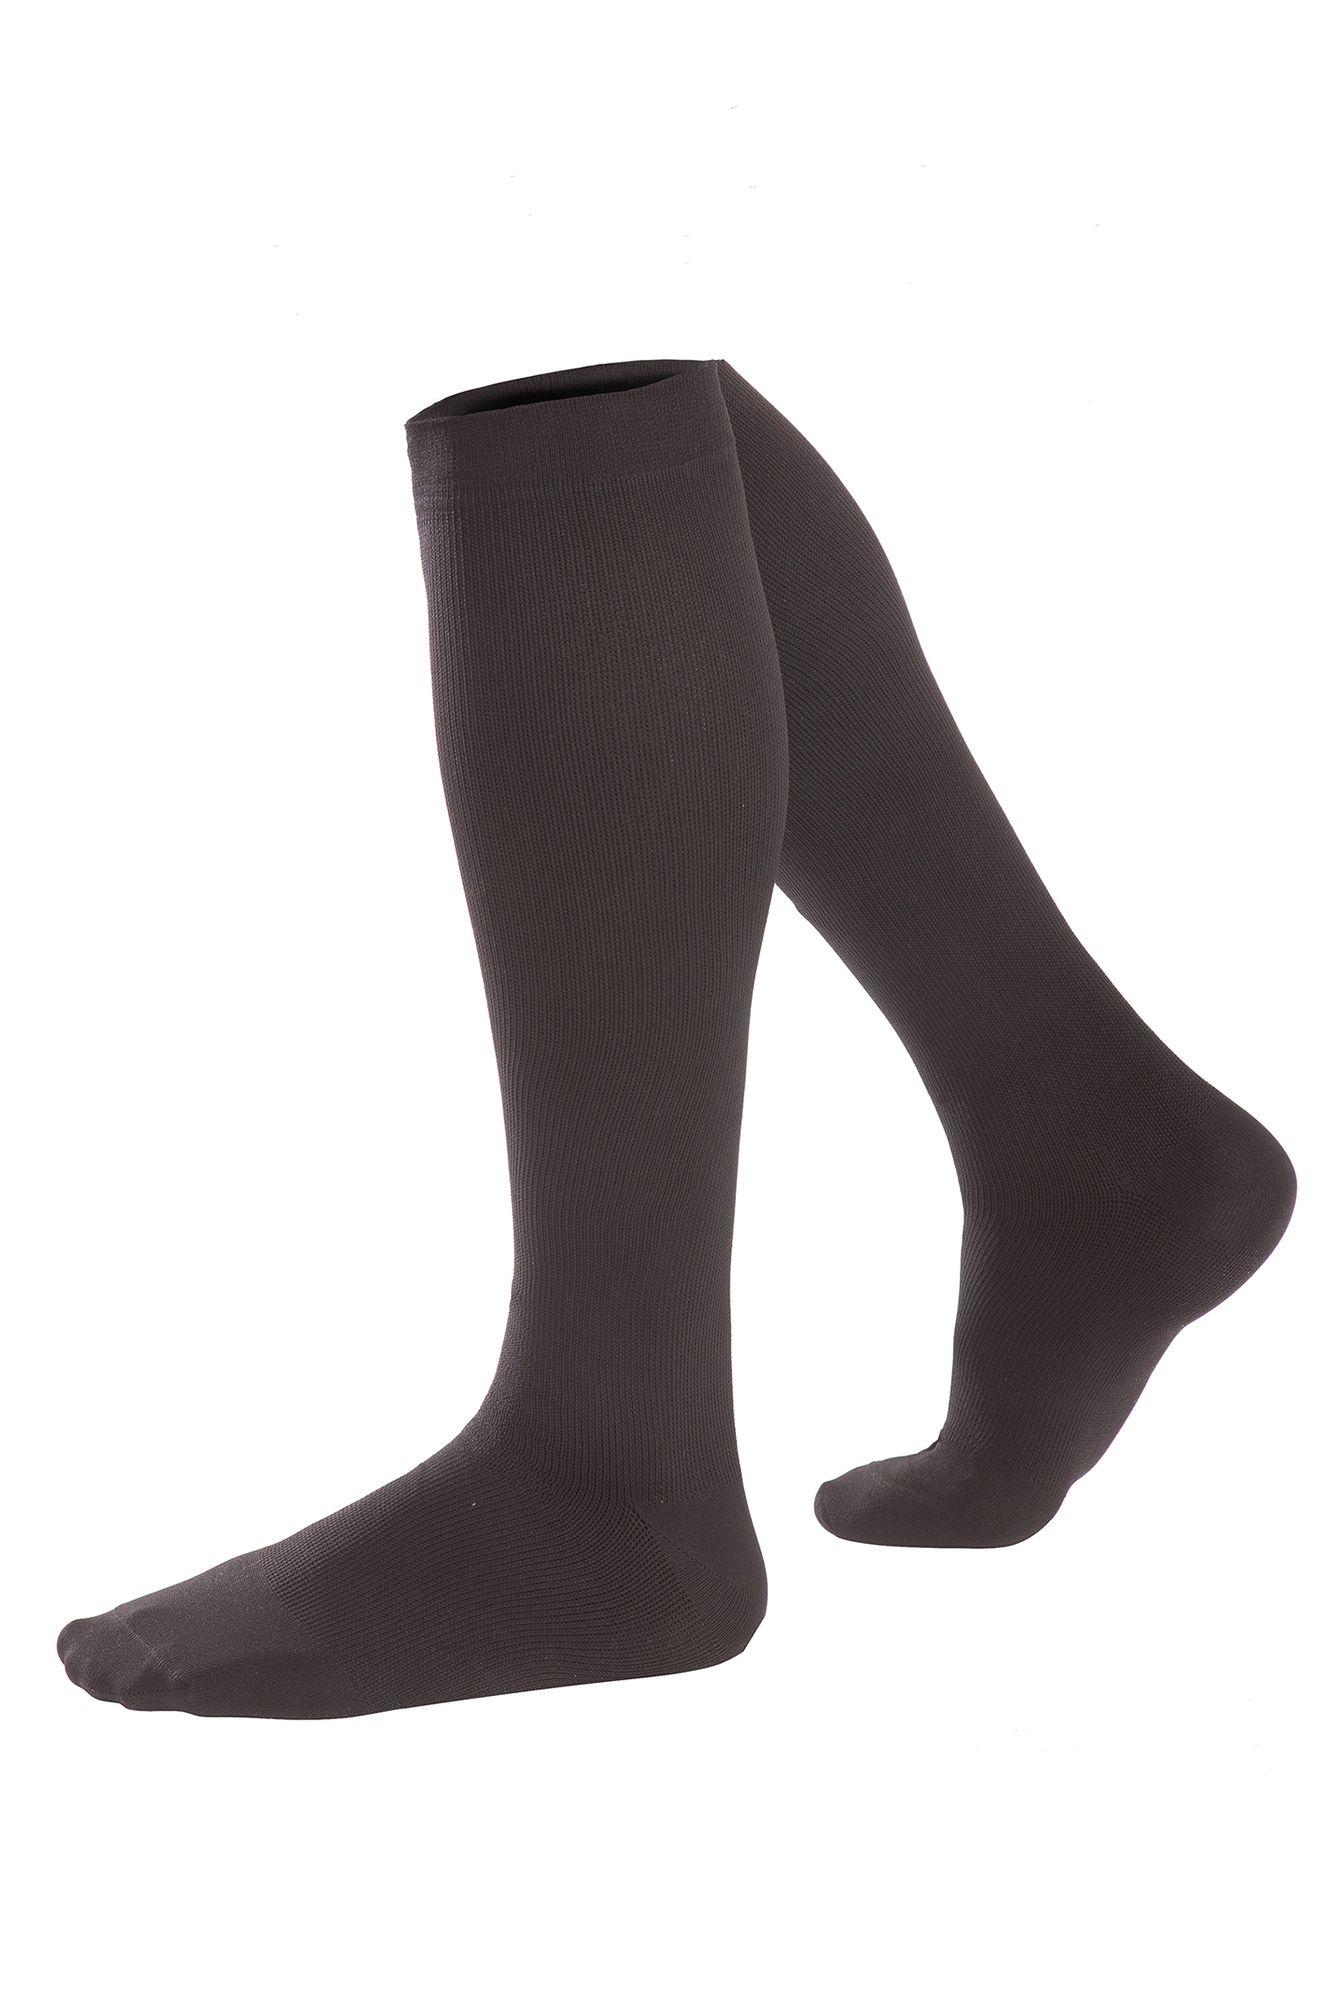 Venosan 174 Supportline Mens Compression Socks 18 22mmhg